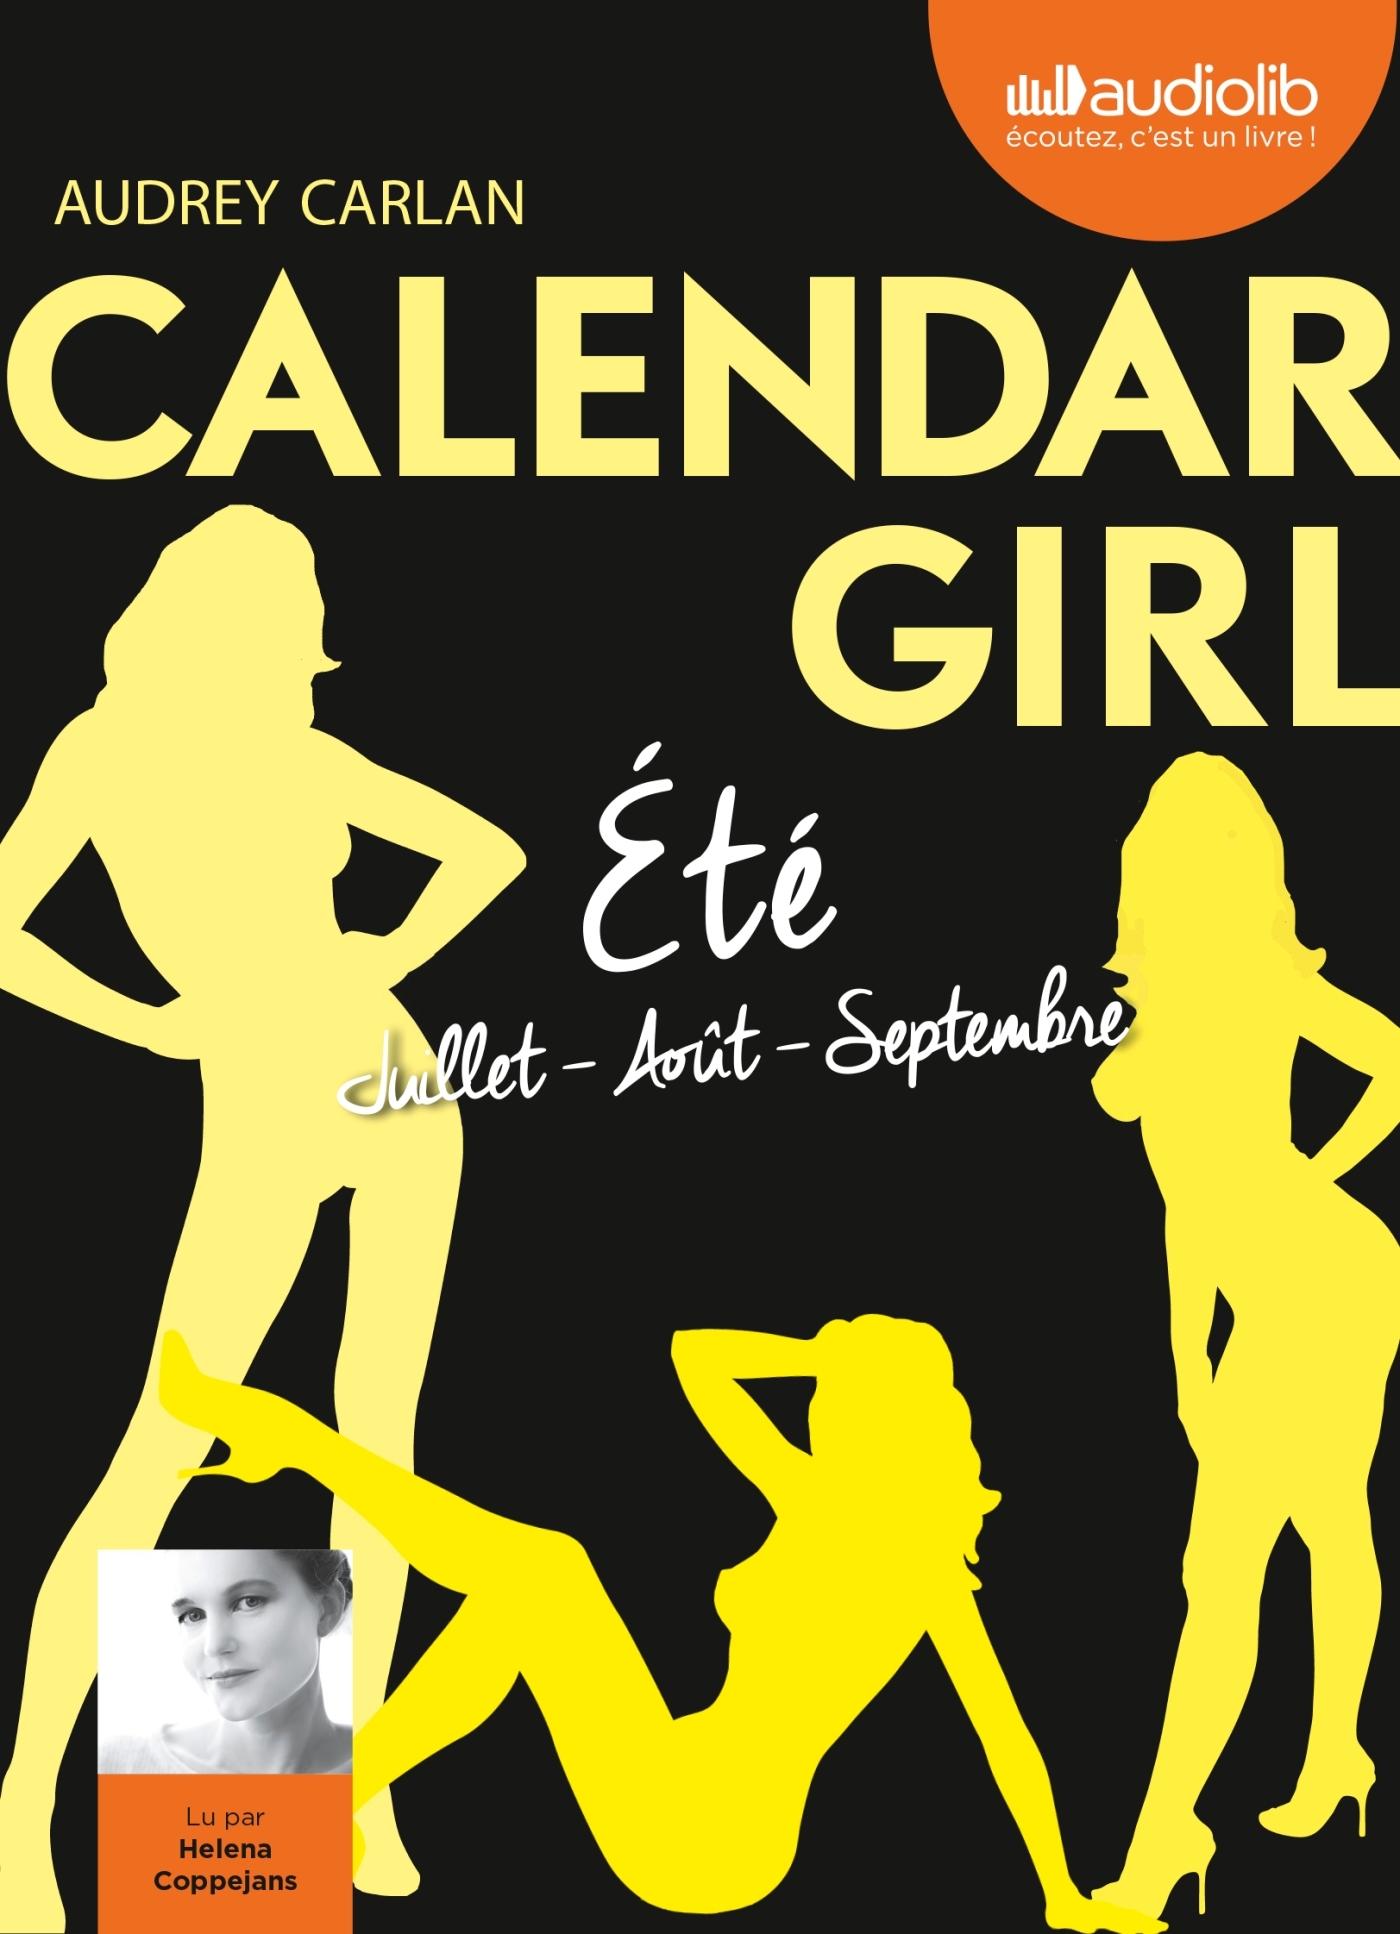 CALENDAR GIRL 3 - ETE (JUILLET, AOUT, SEPTEMBRE)